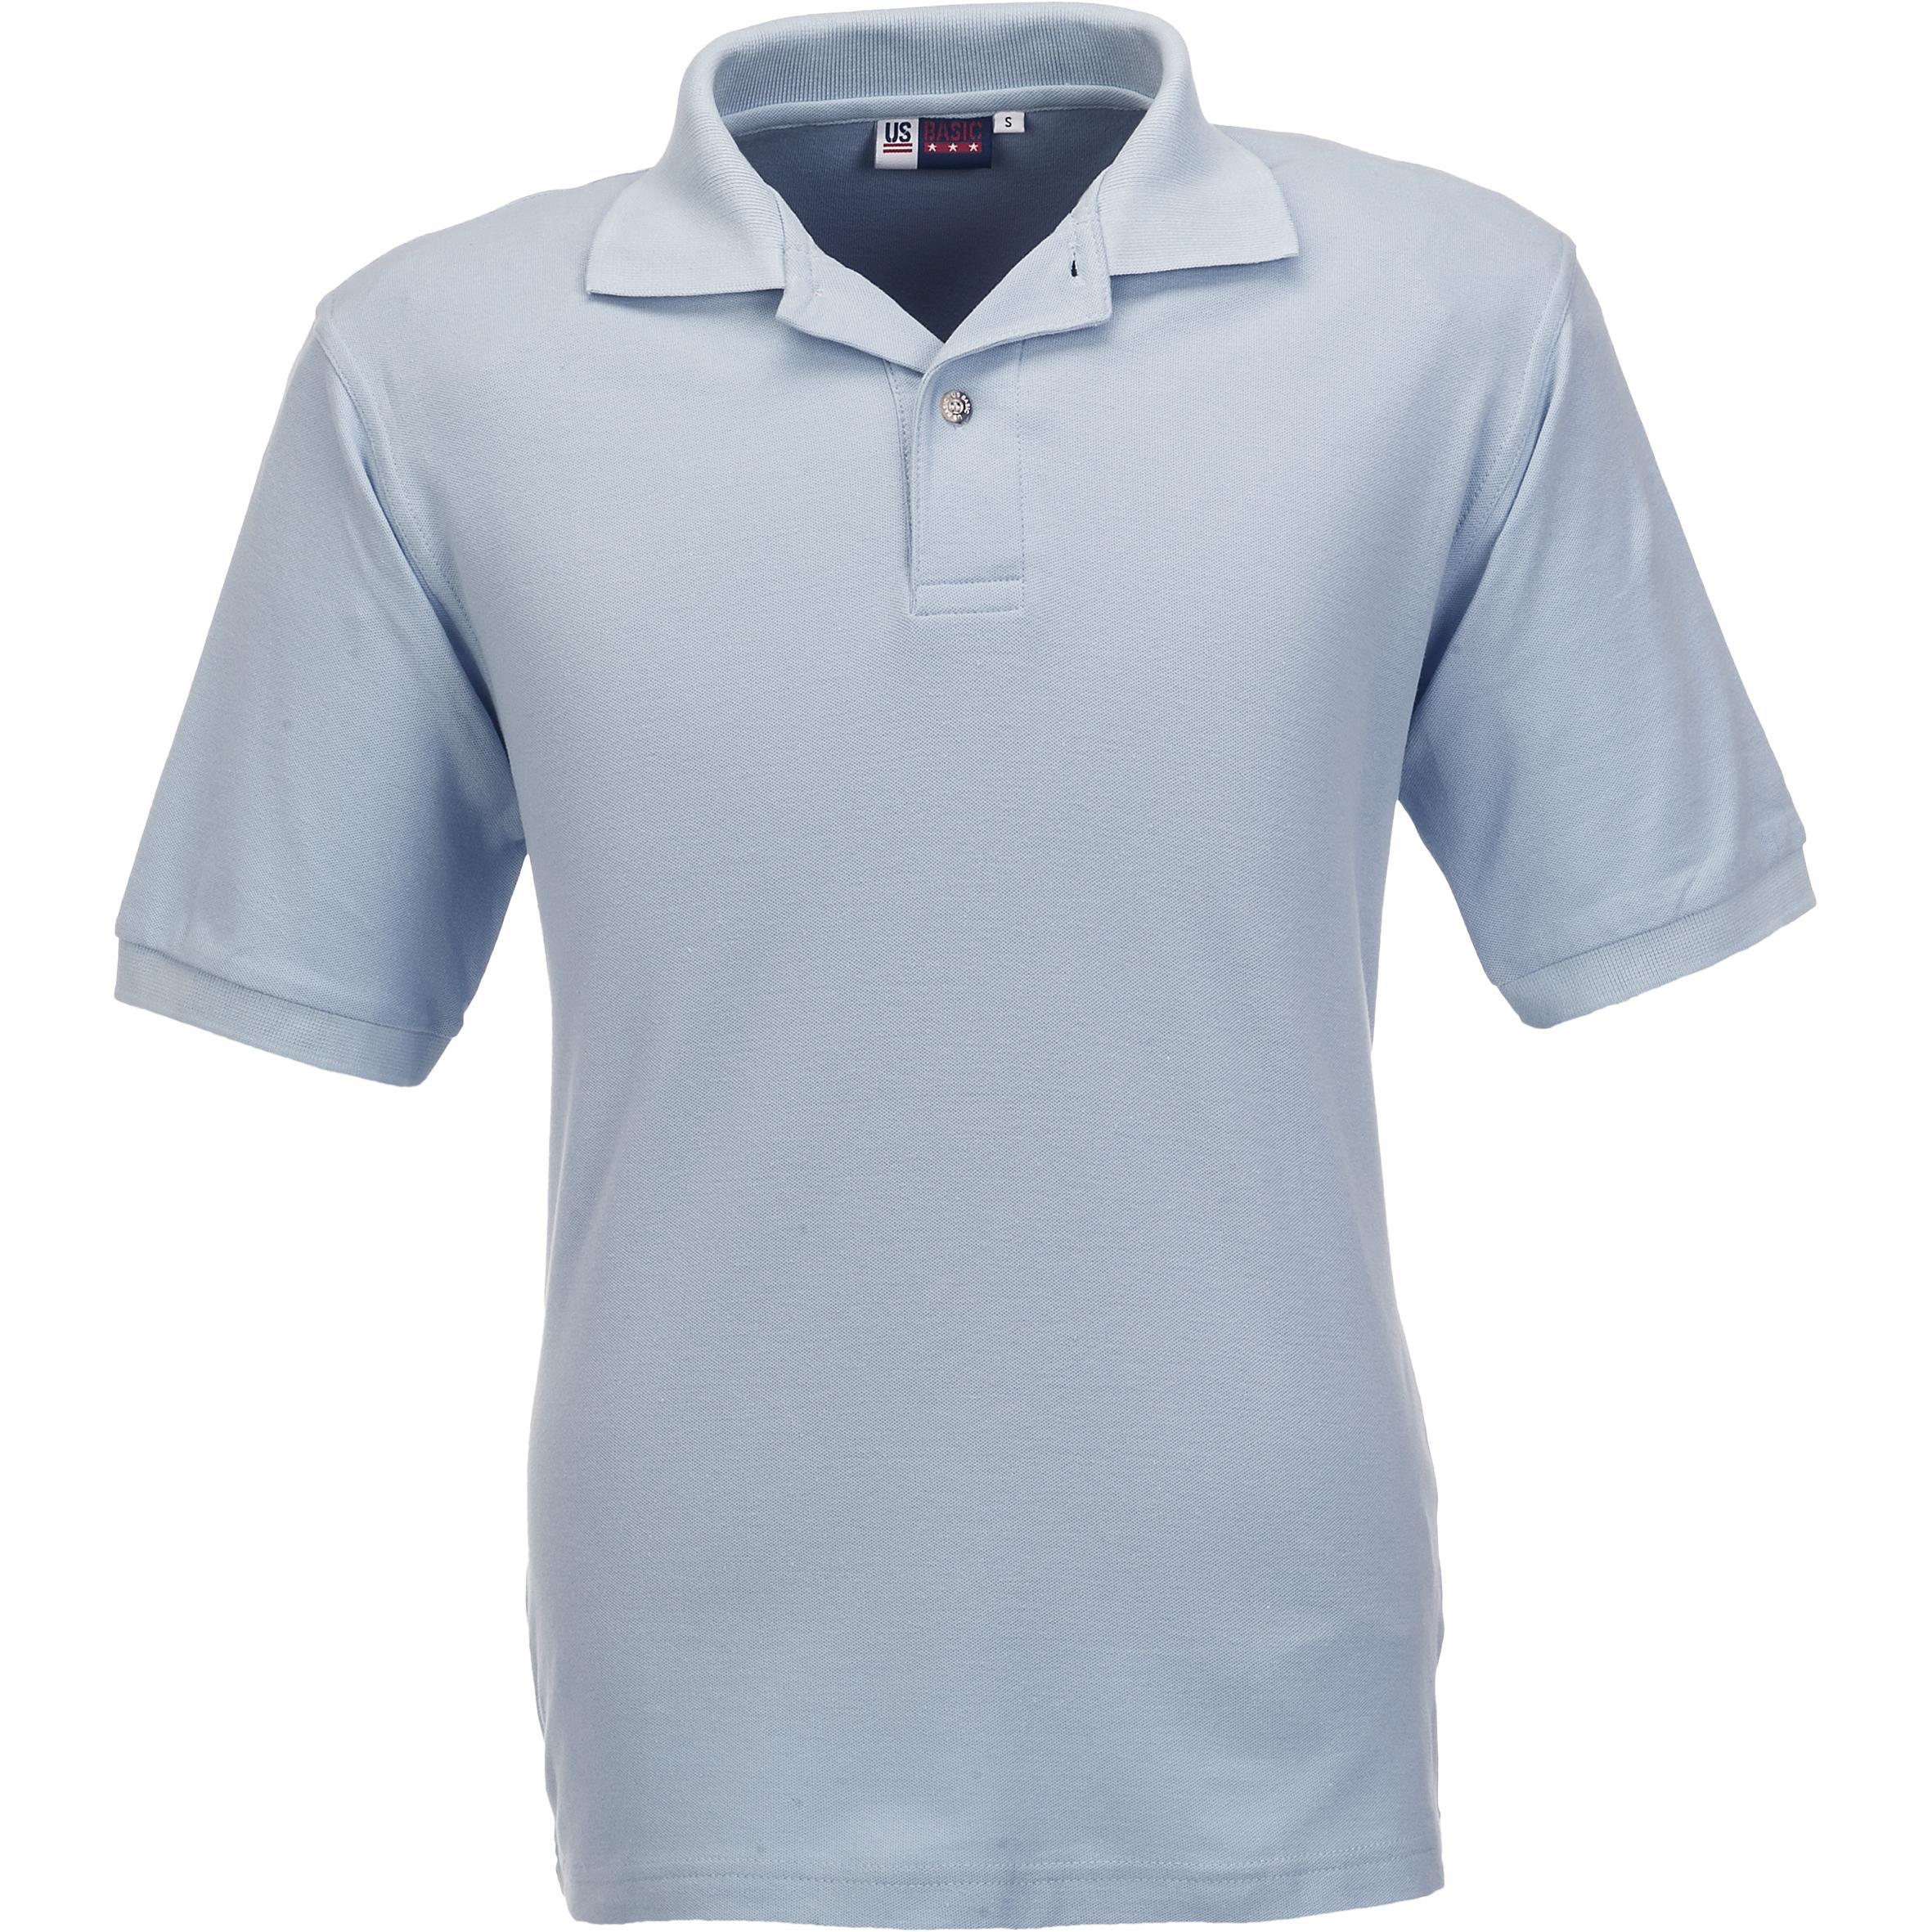 Mens Boston Golf Shirt - Ocean Blue Only